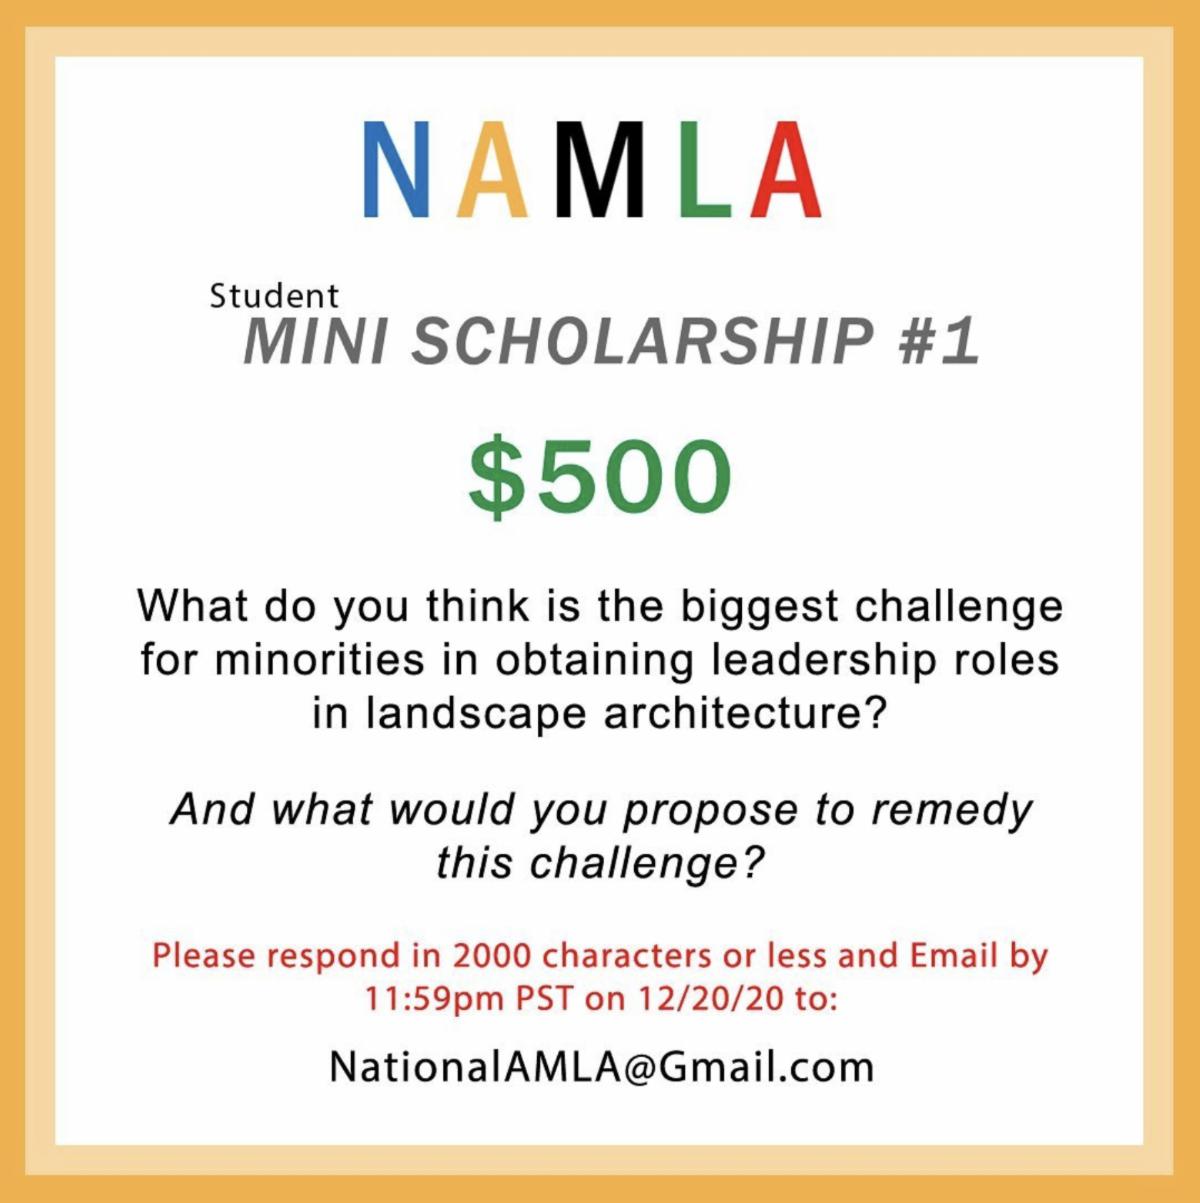 namla mini scholarship deadline december 20 2020